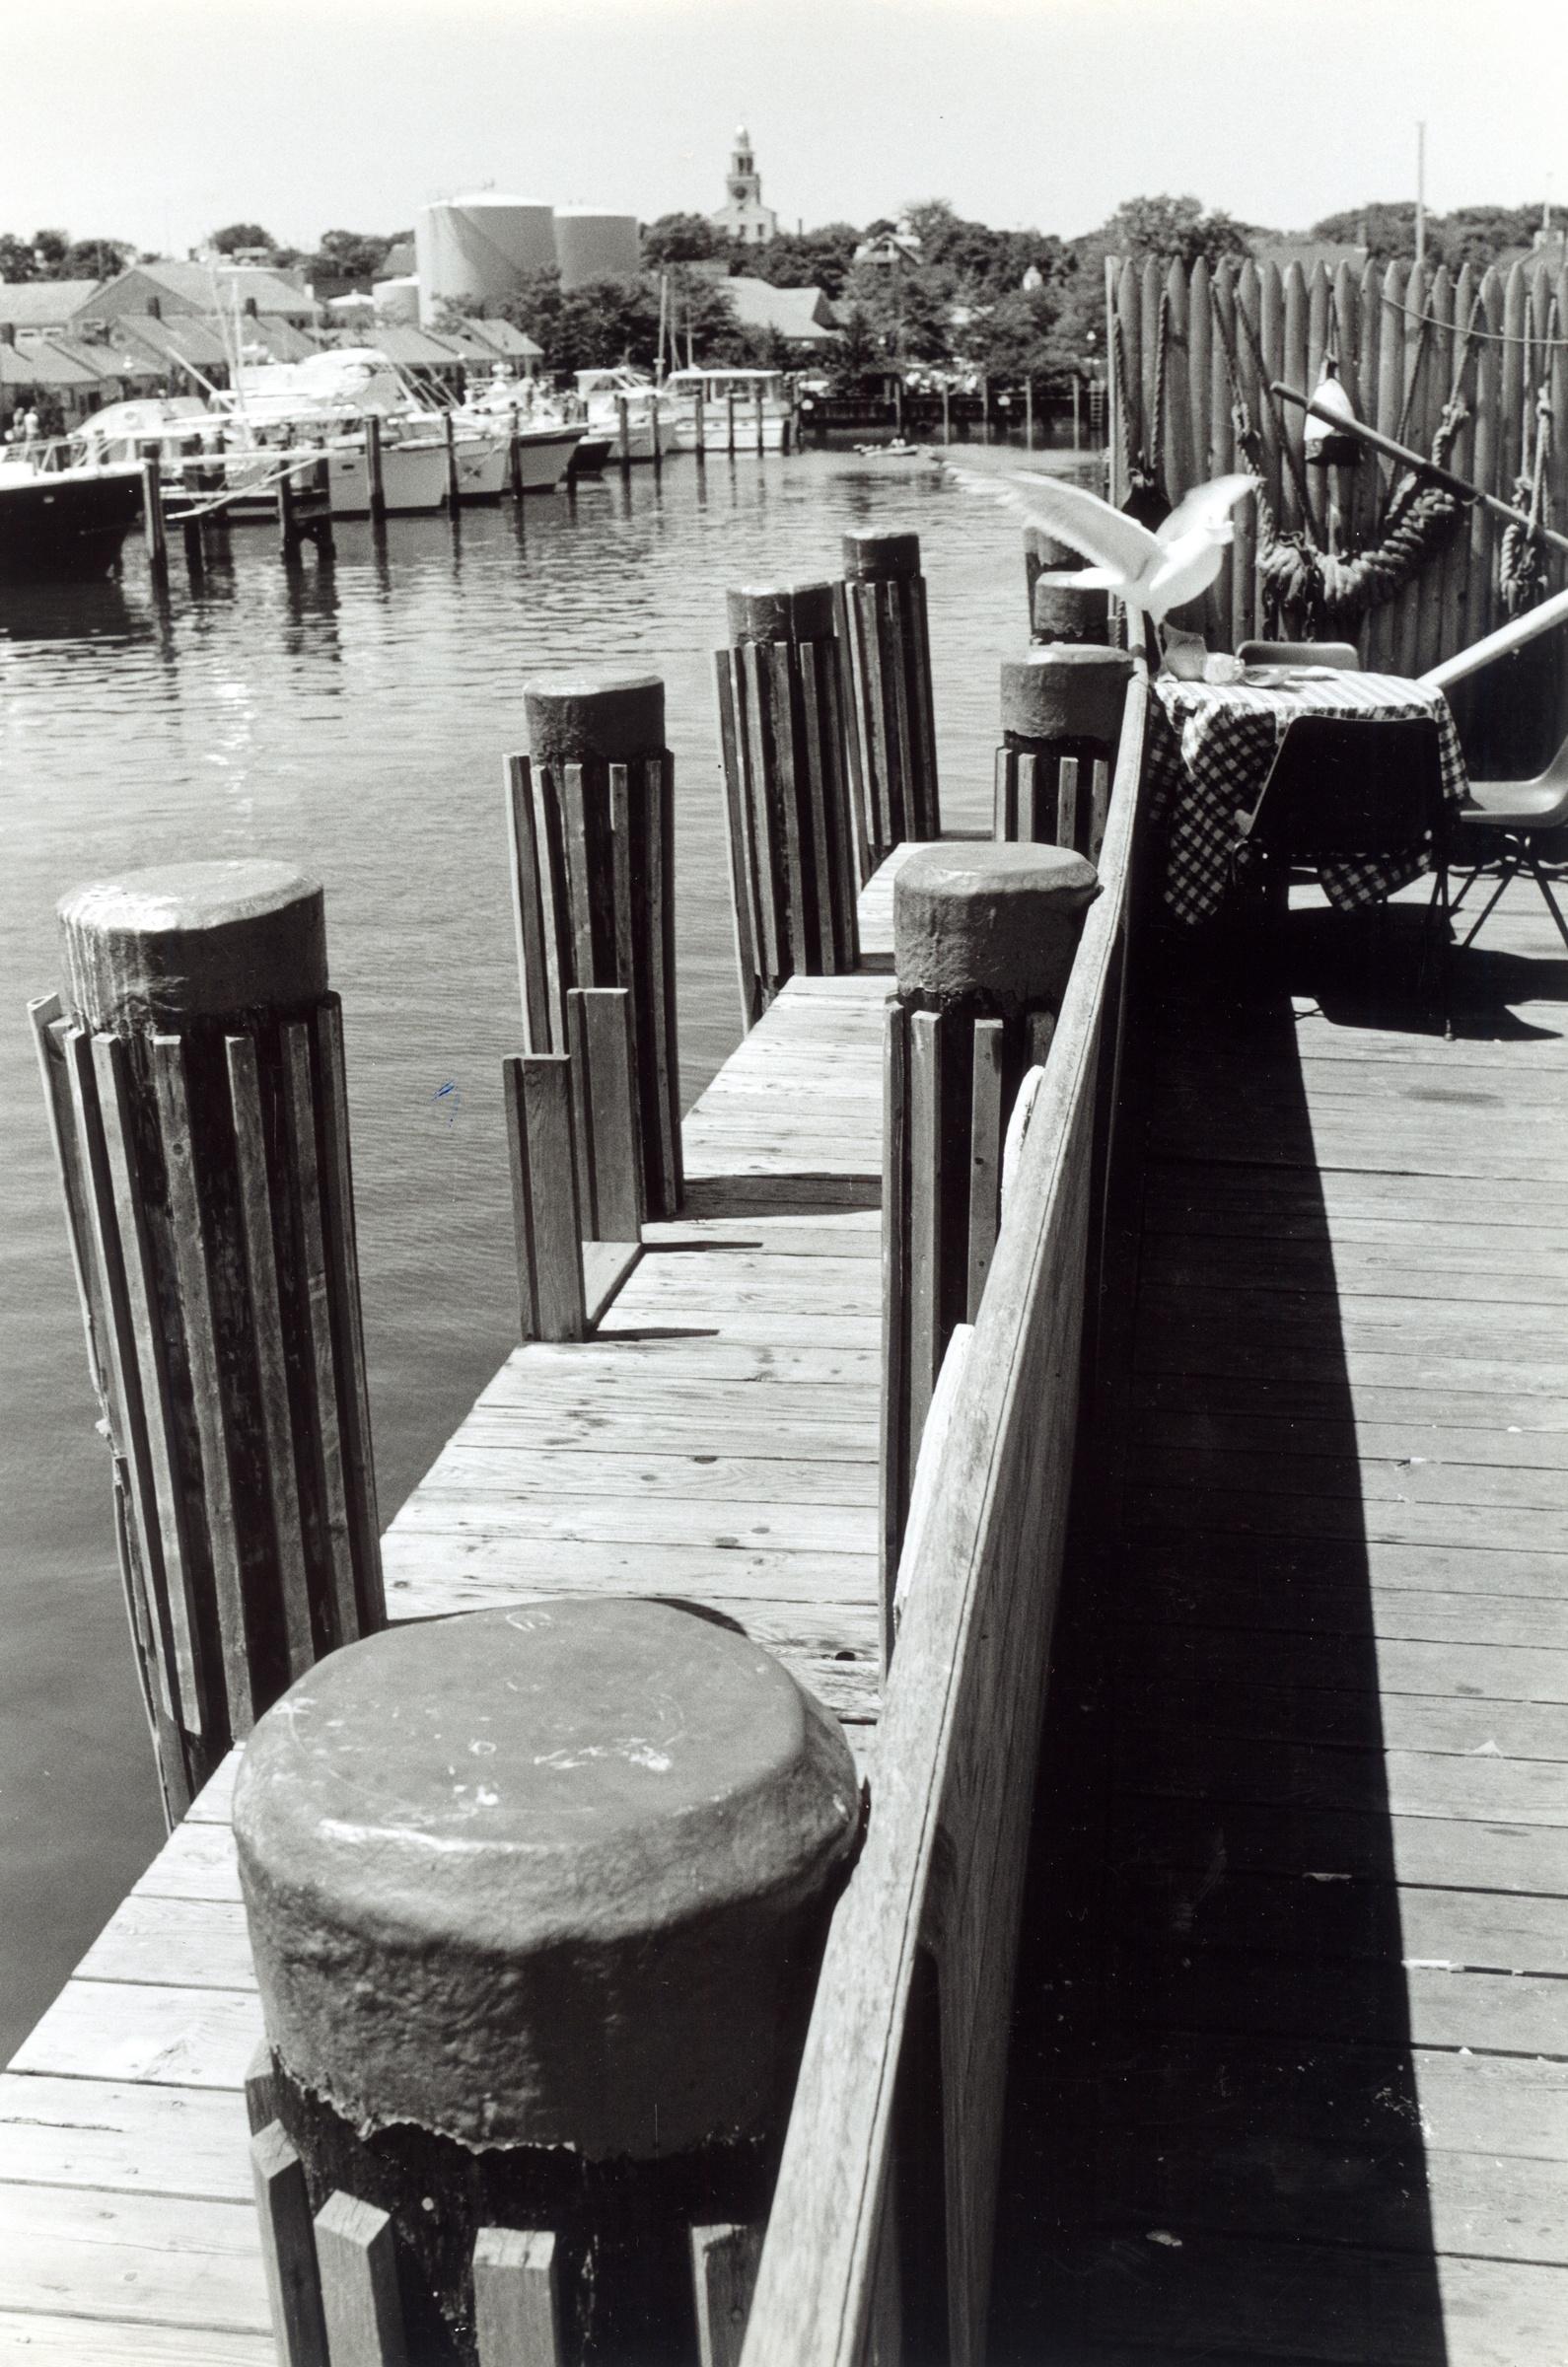 Nantucket Boat Basin - View from the Sail Loft